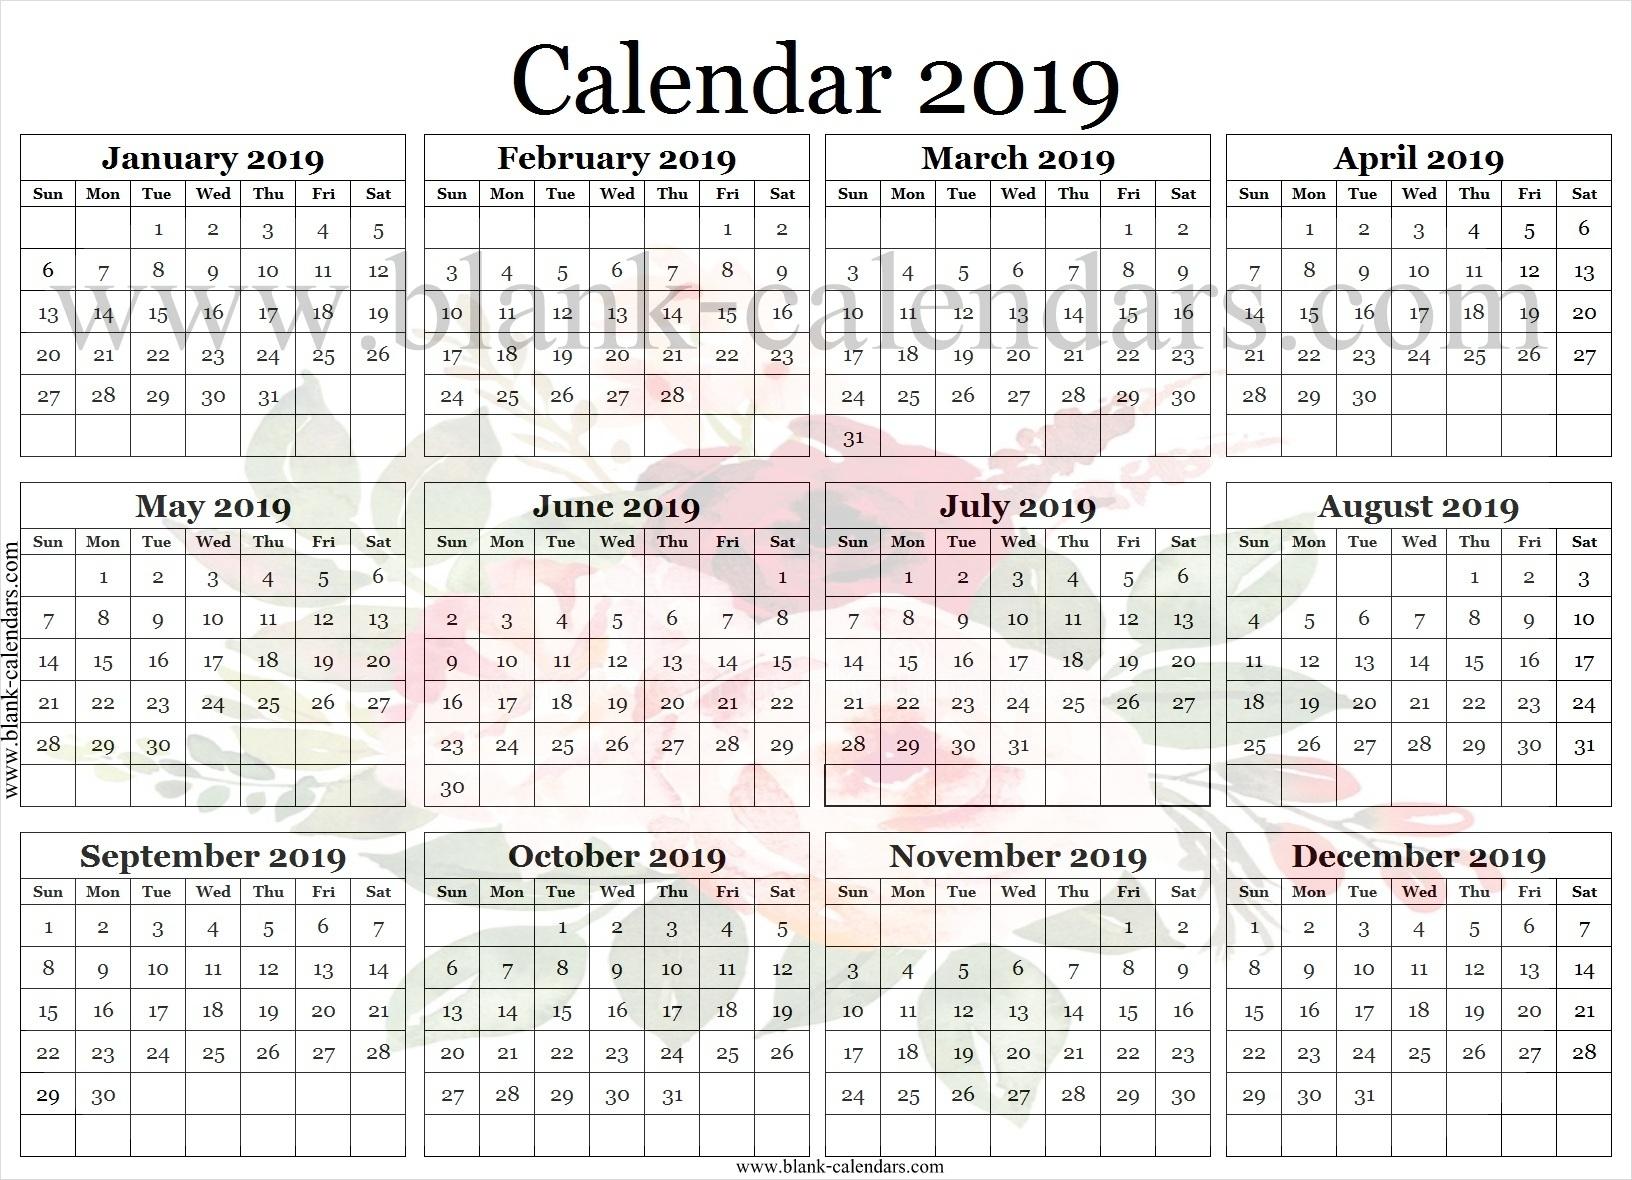 2019 Calendar Desktop Wallpaper Printable Template | 2019 Calendar throughout Blank Screensaver Template To Print